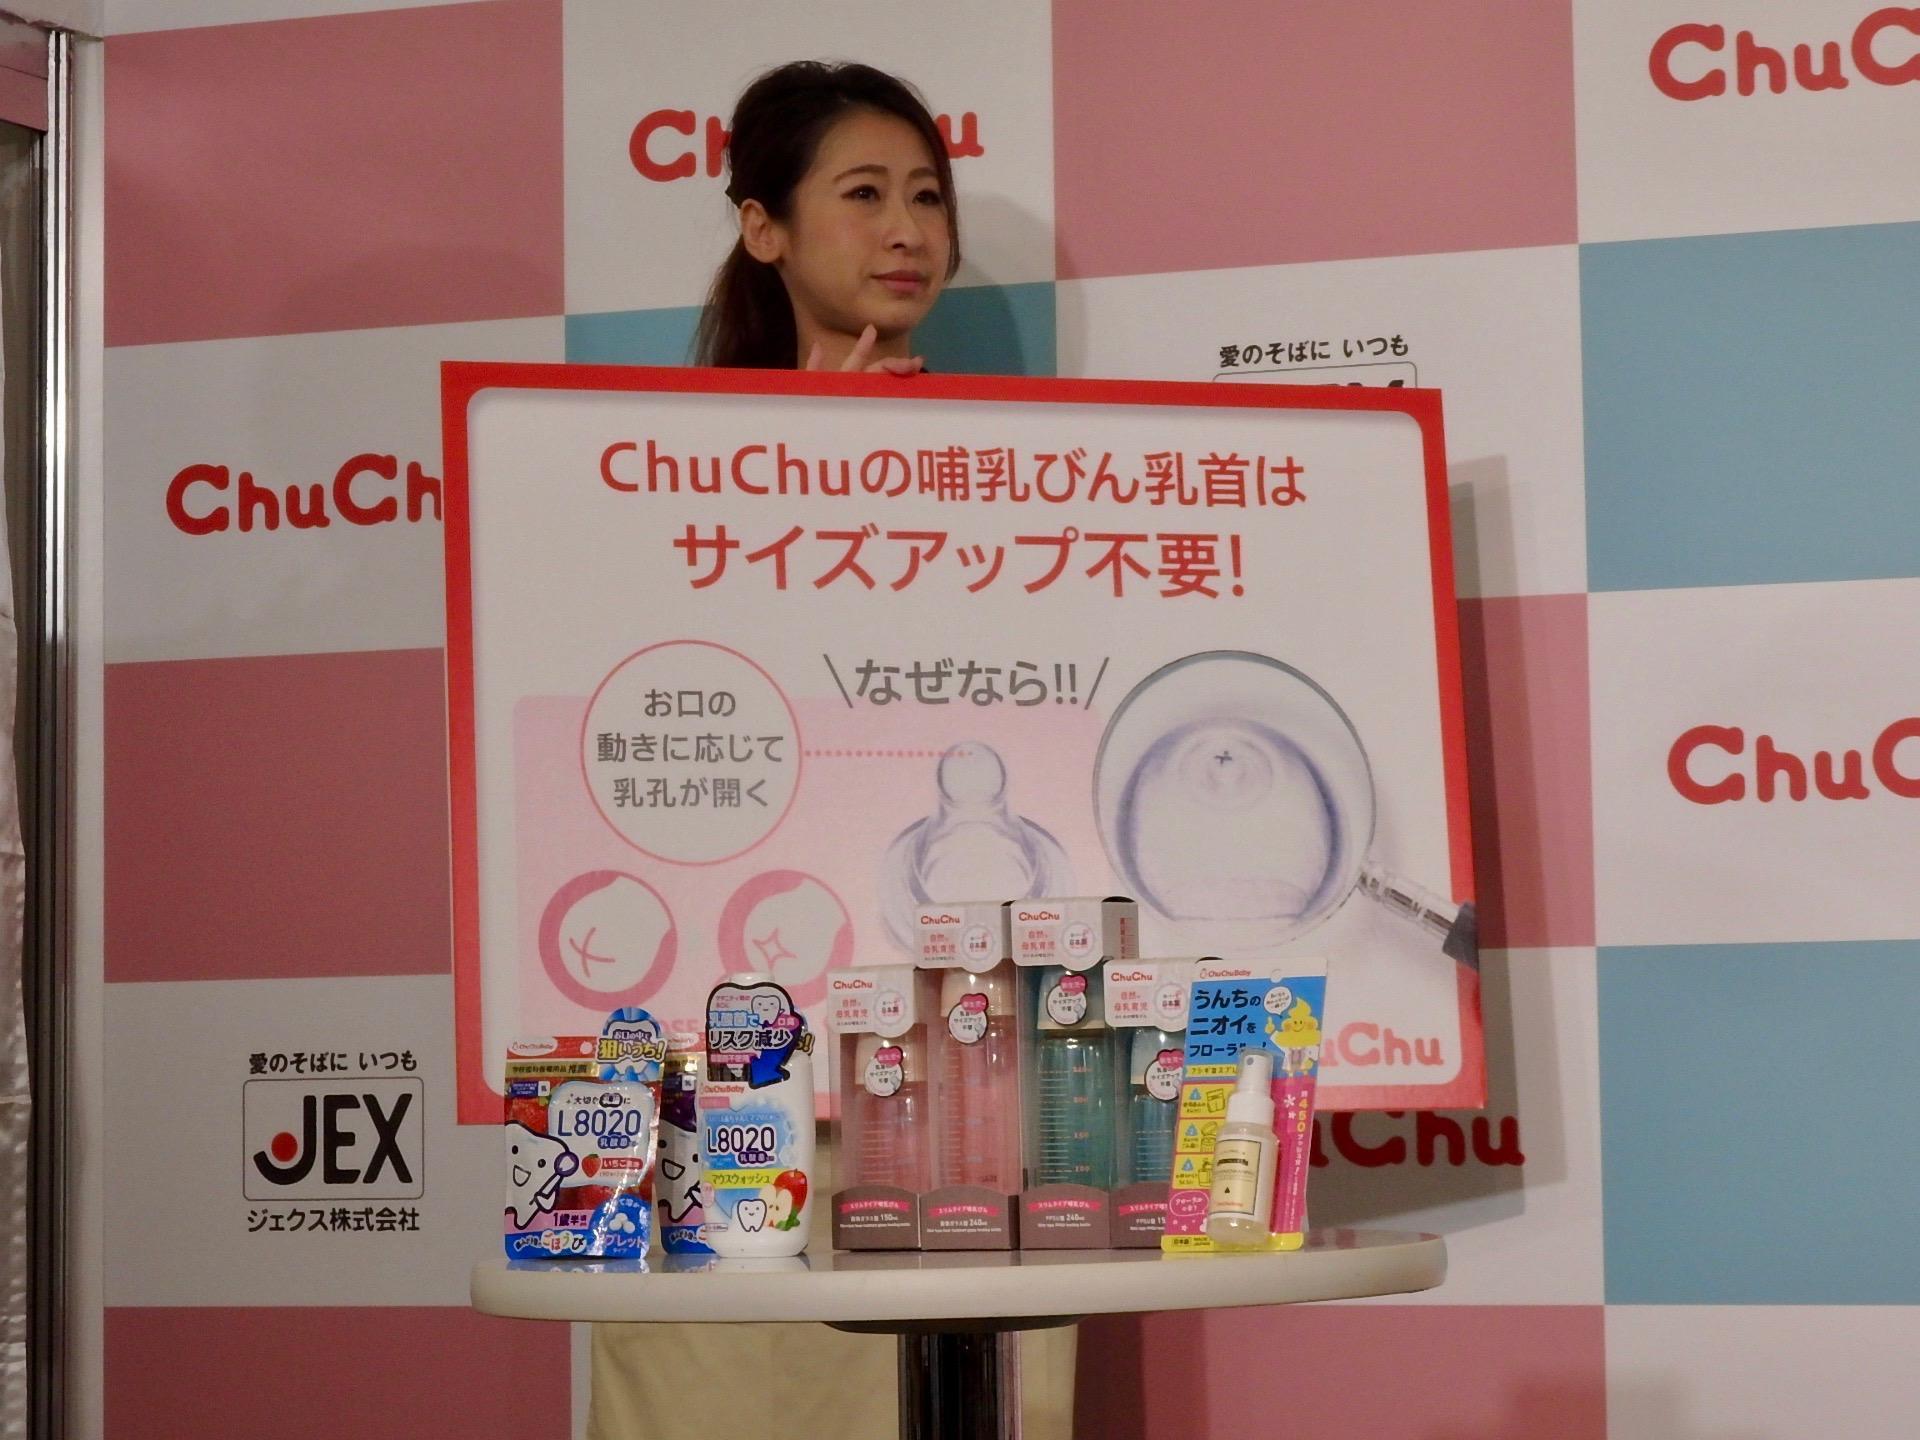 http://news.yoshimoto.co.jp/20180929173234-d037d4cd7f3eae7254fa19af2ae35183390ff610.jpg